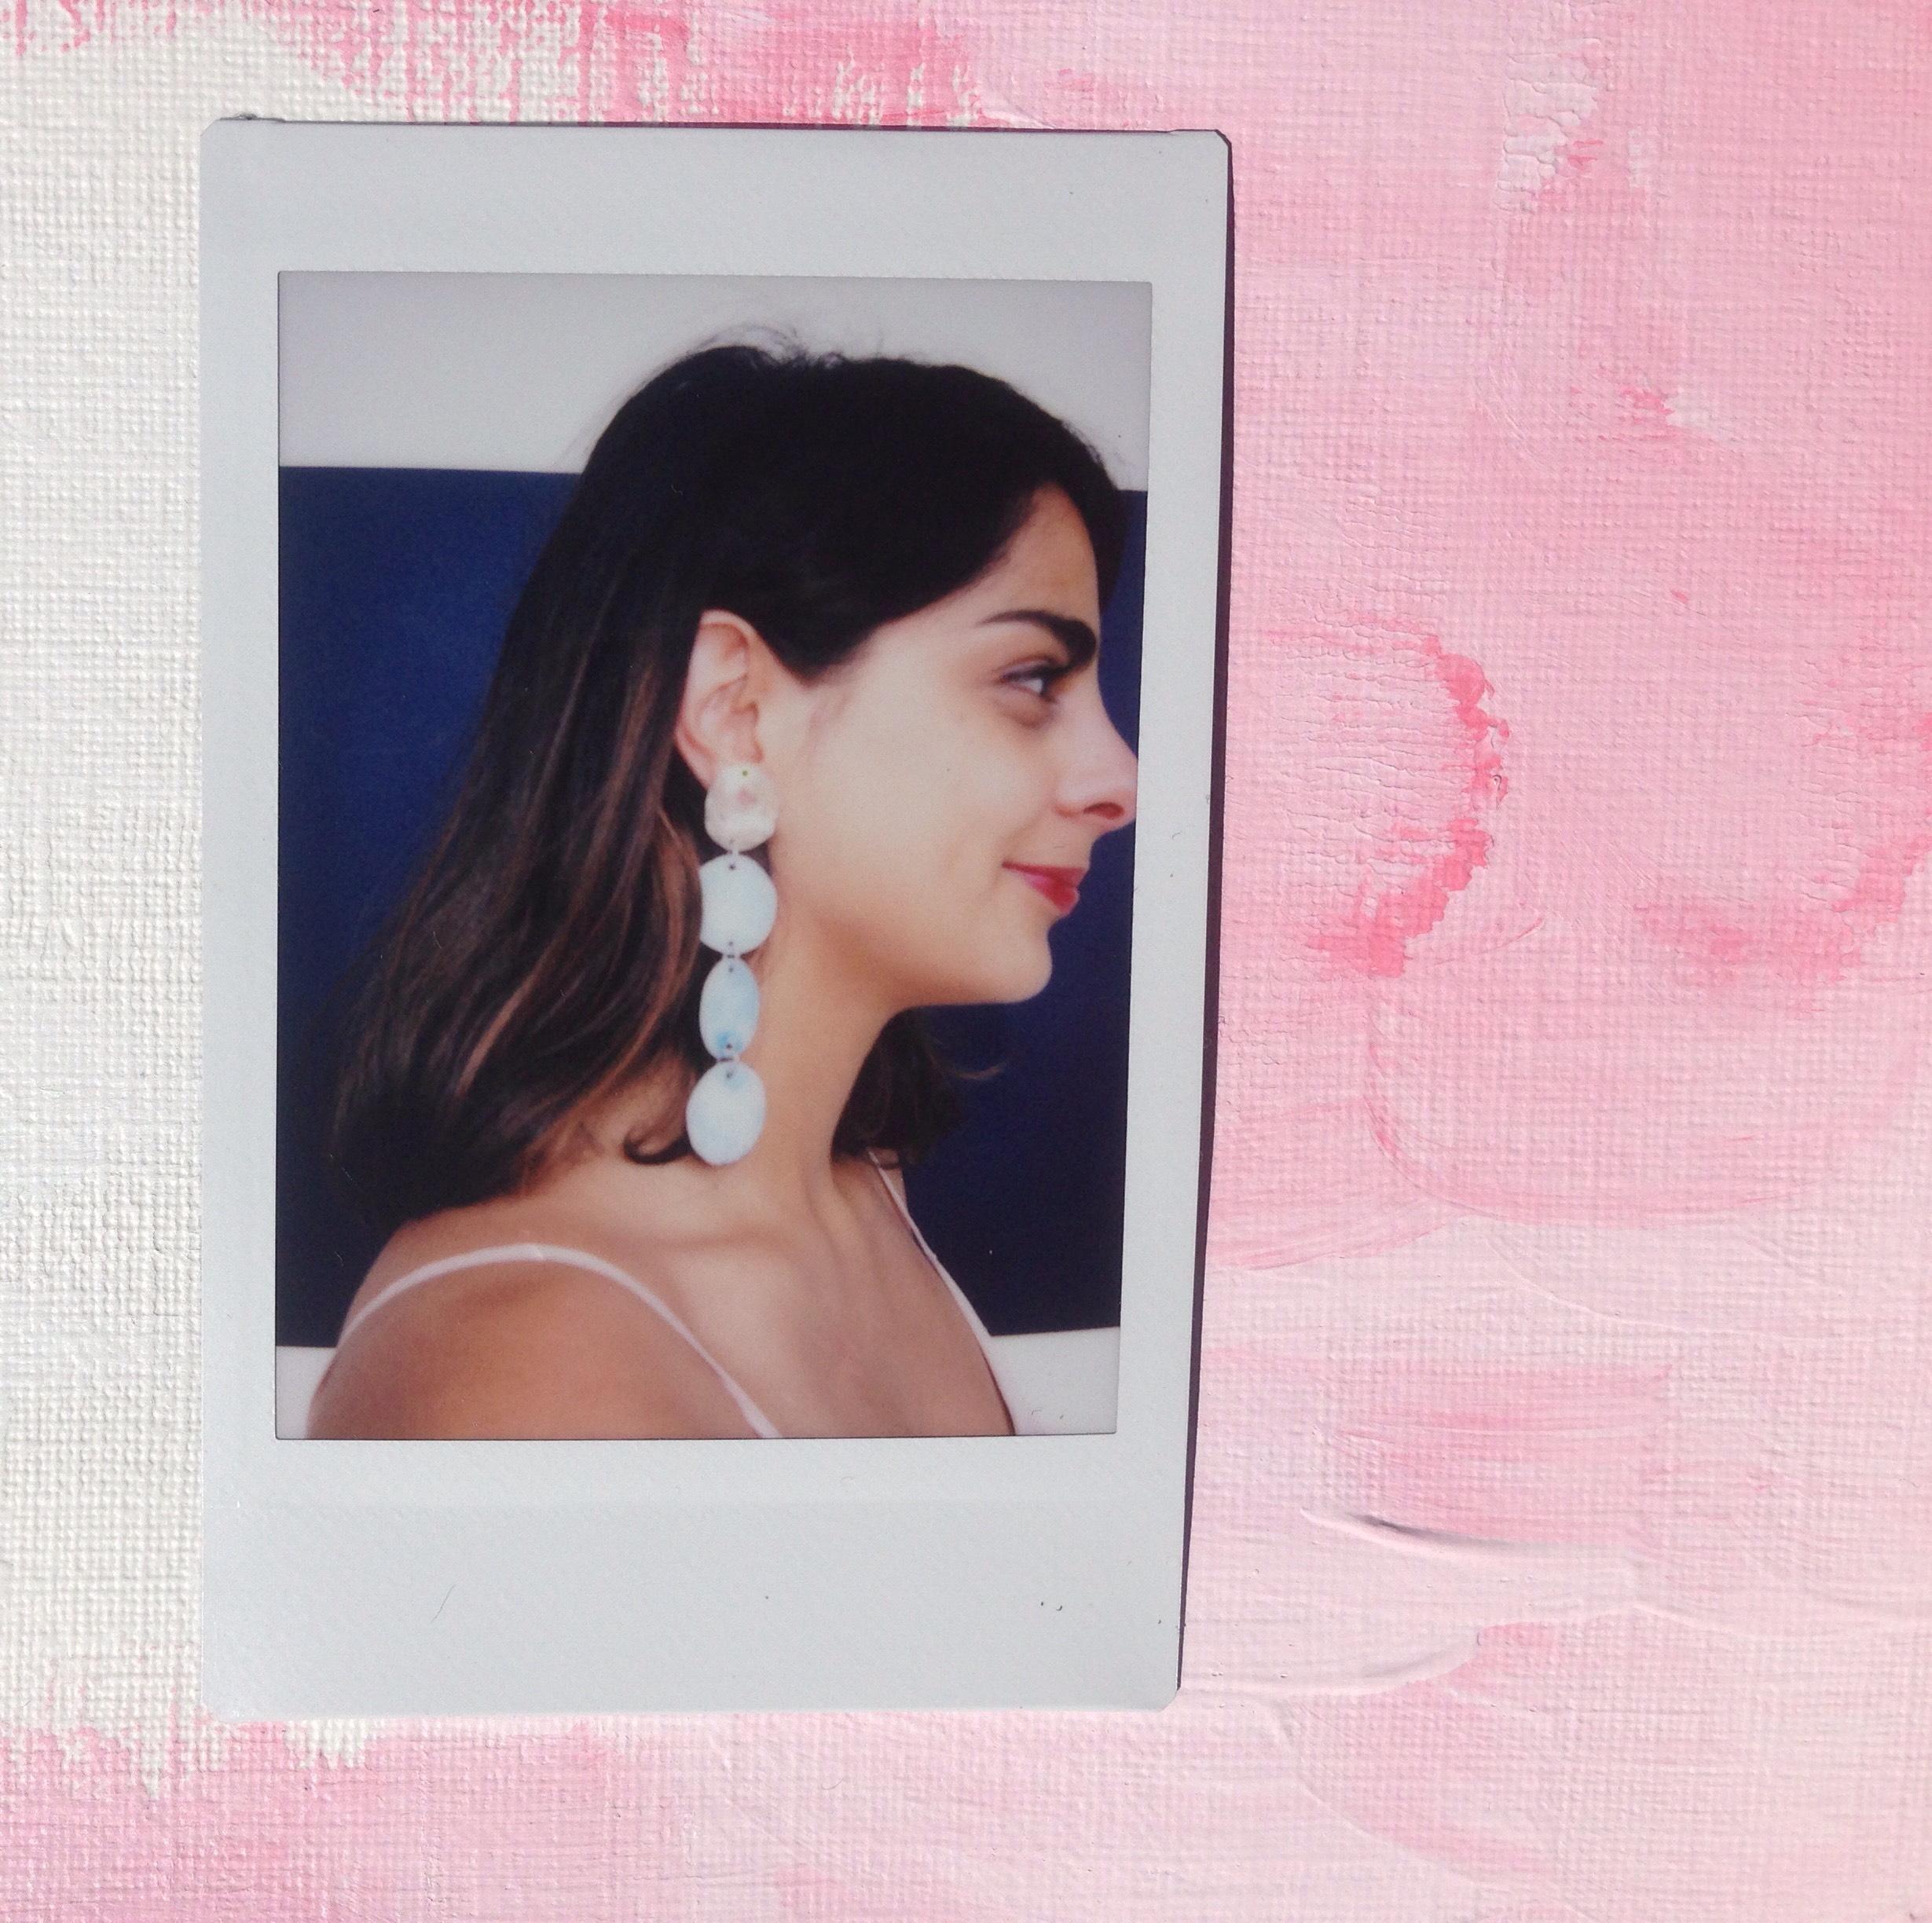 ada-hodgson-contemporary-australian-jewellery-designer-jeweller-handmade-mebourne-custom-engagement-wedding-enamel-sterling-jewelry-statement-ring-earrings-handcrafted-unique-bespoke